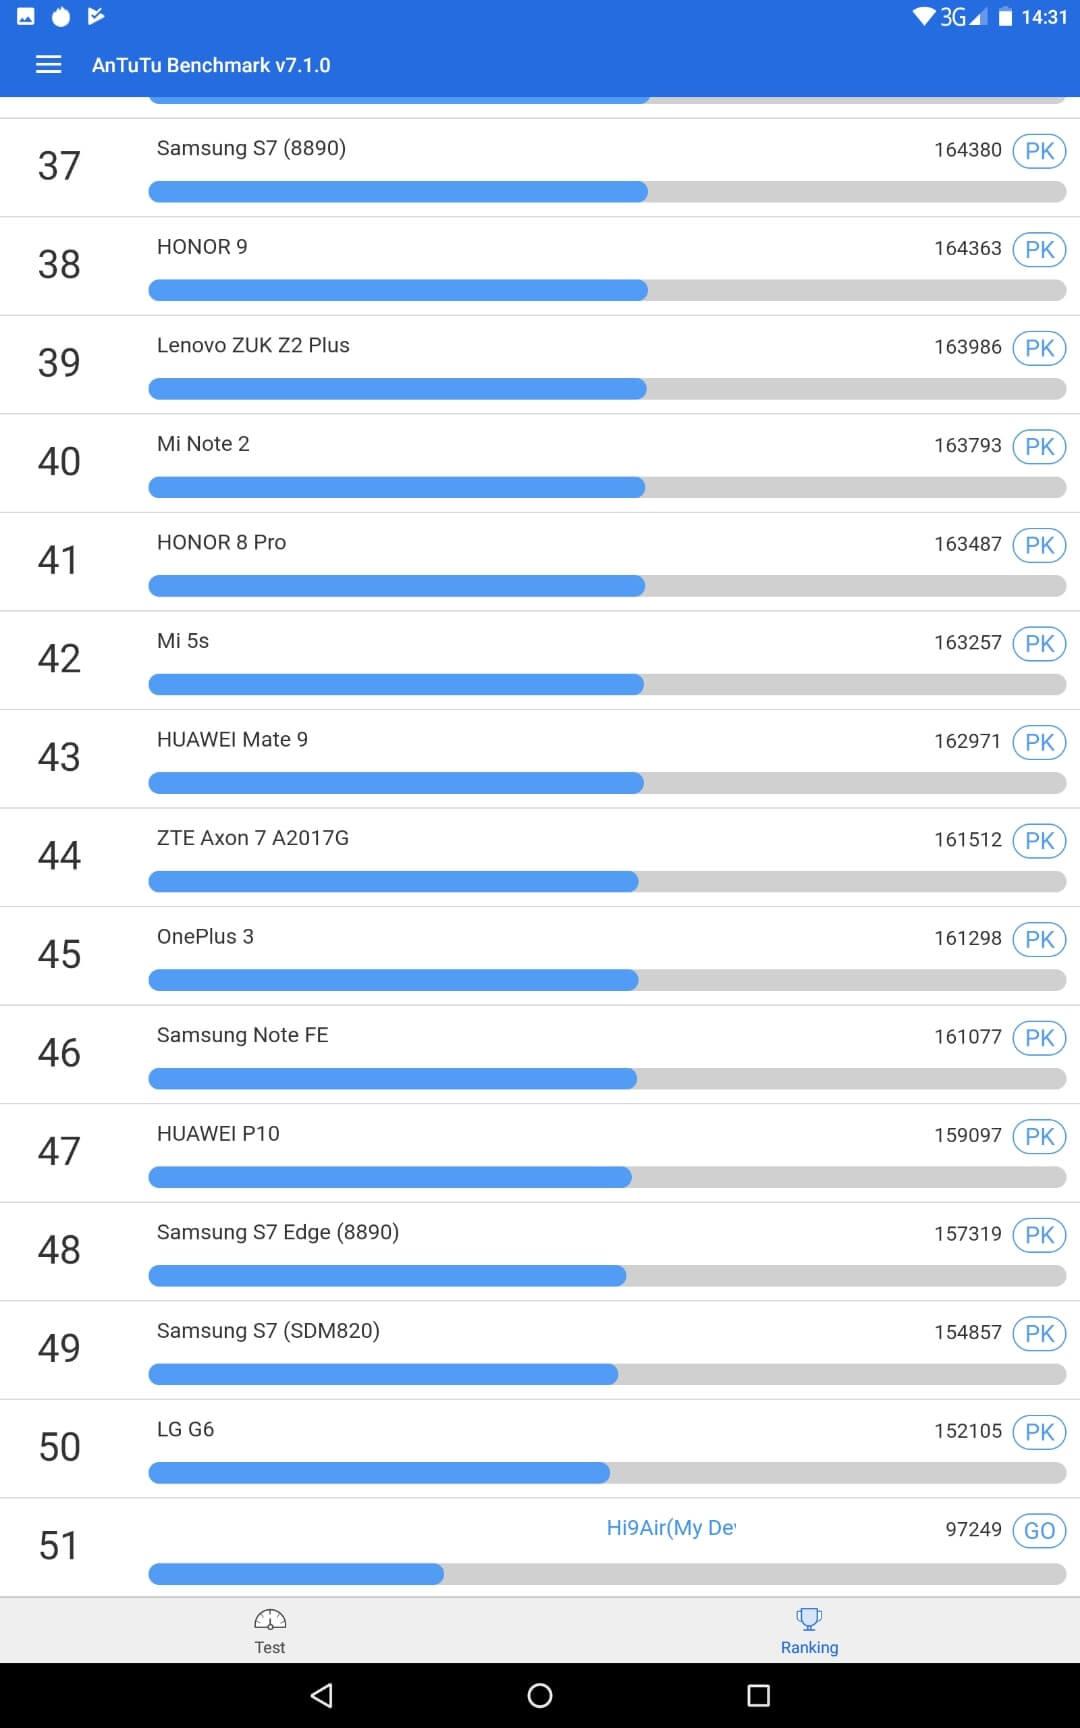 Chuwi Hi9 Air Review Screenshot Bench Results 07